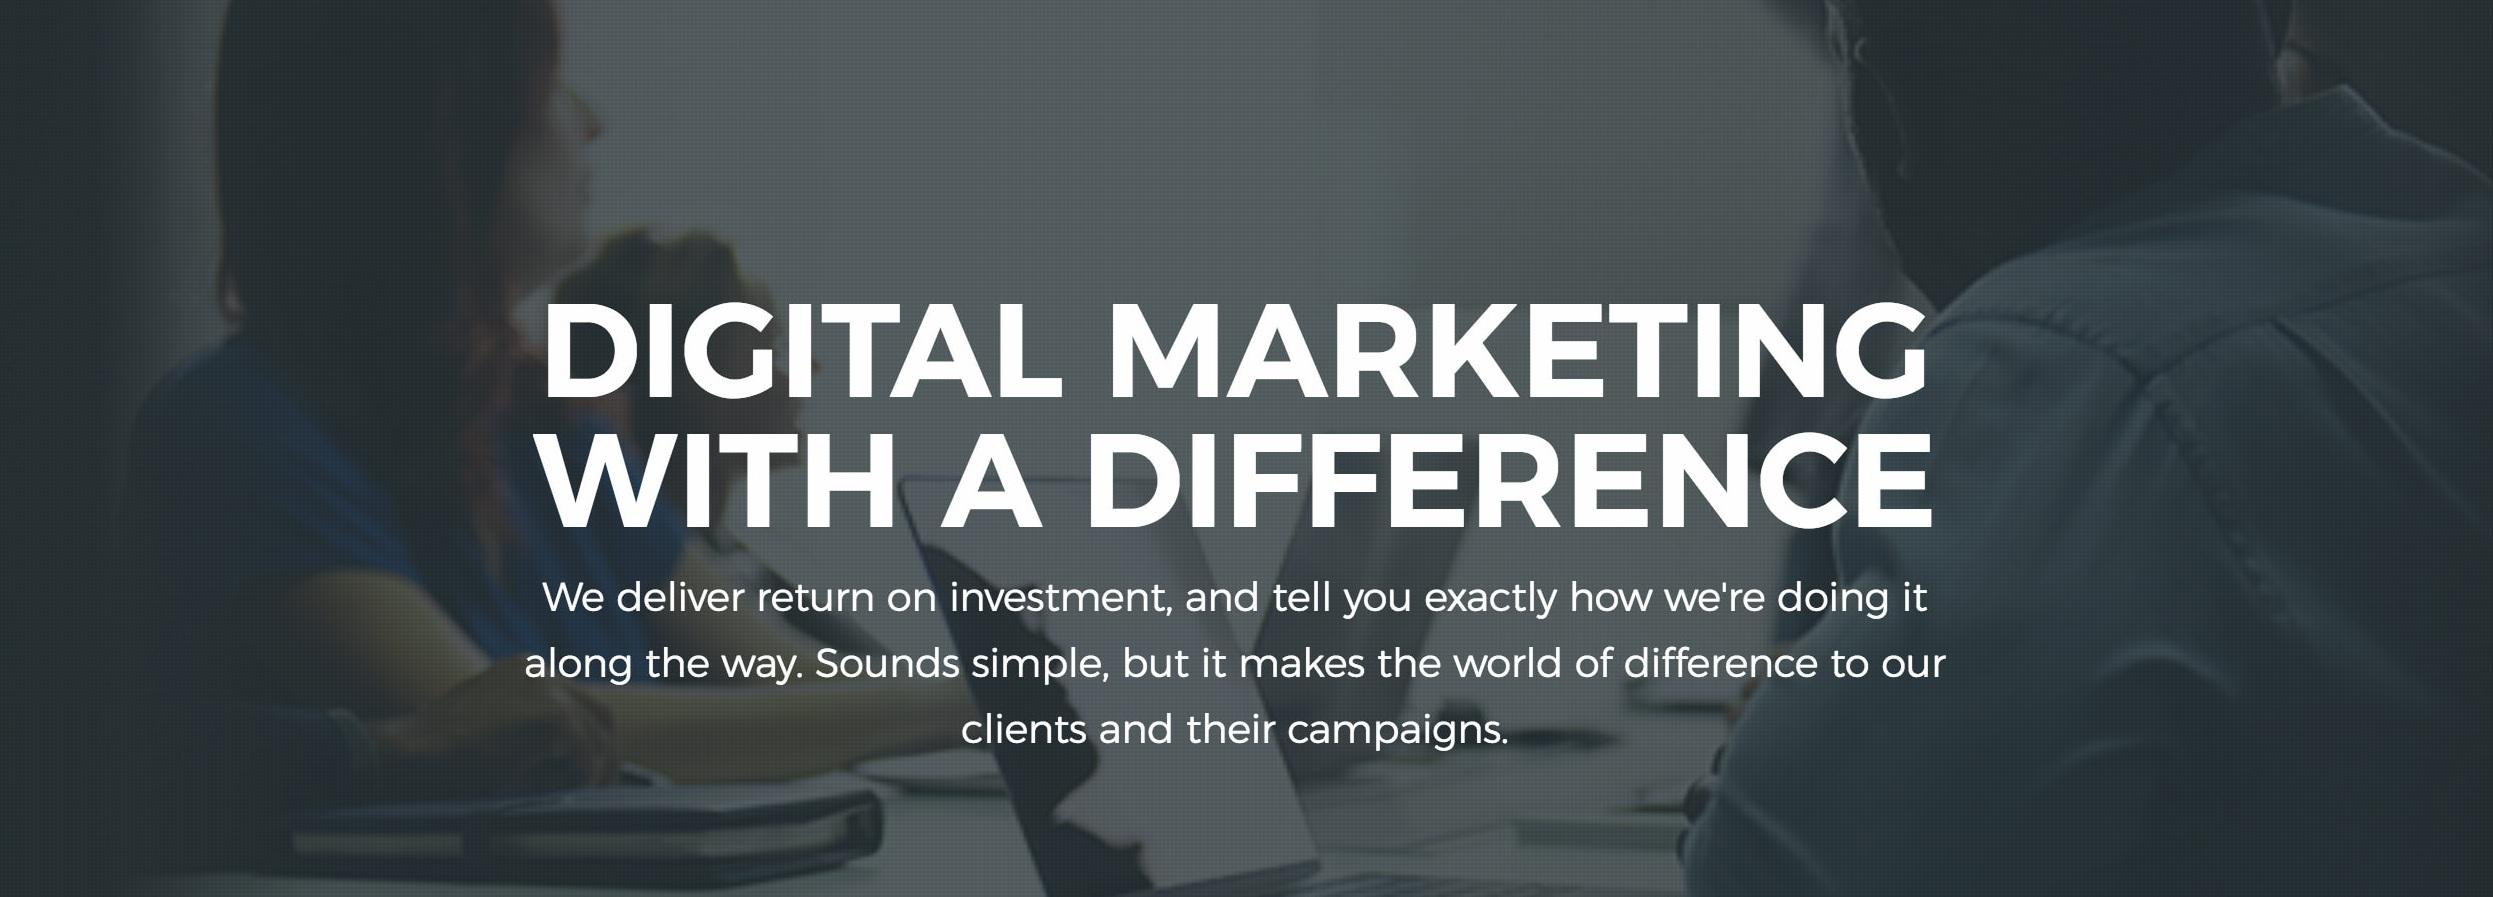 digital marketing agency in rajkot